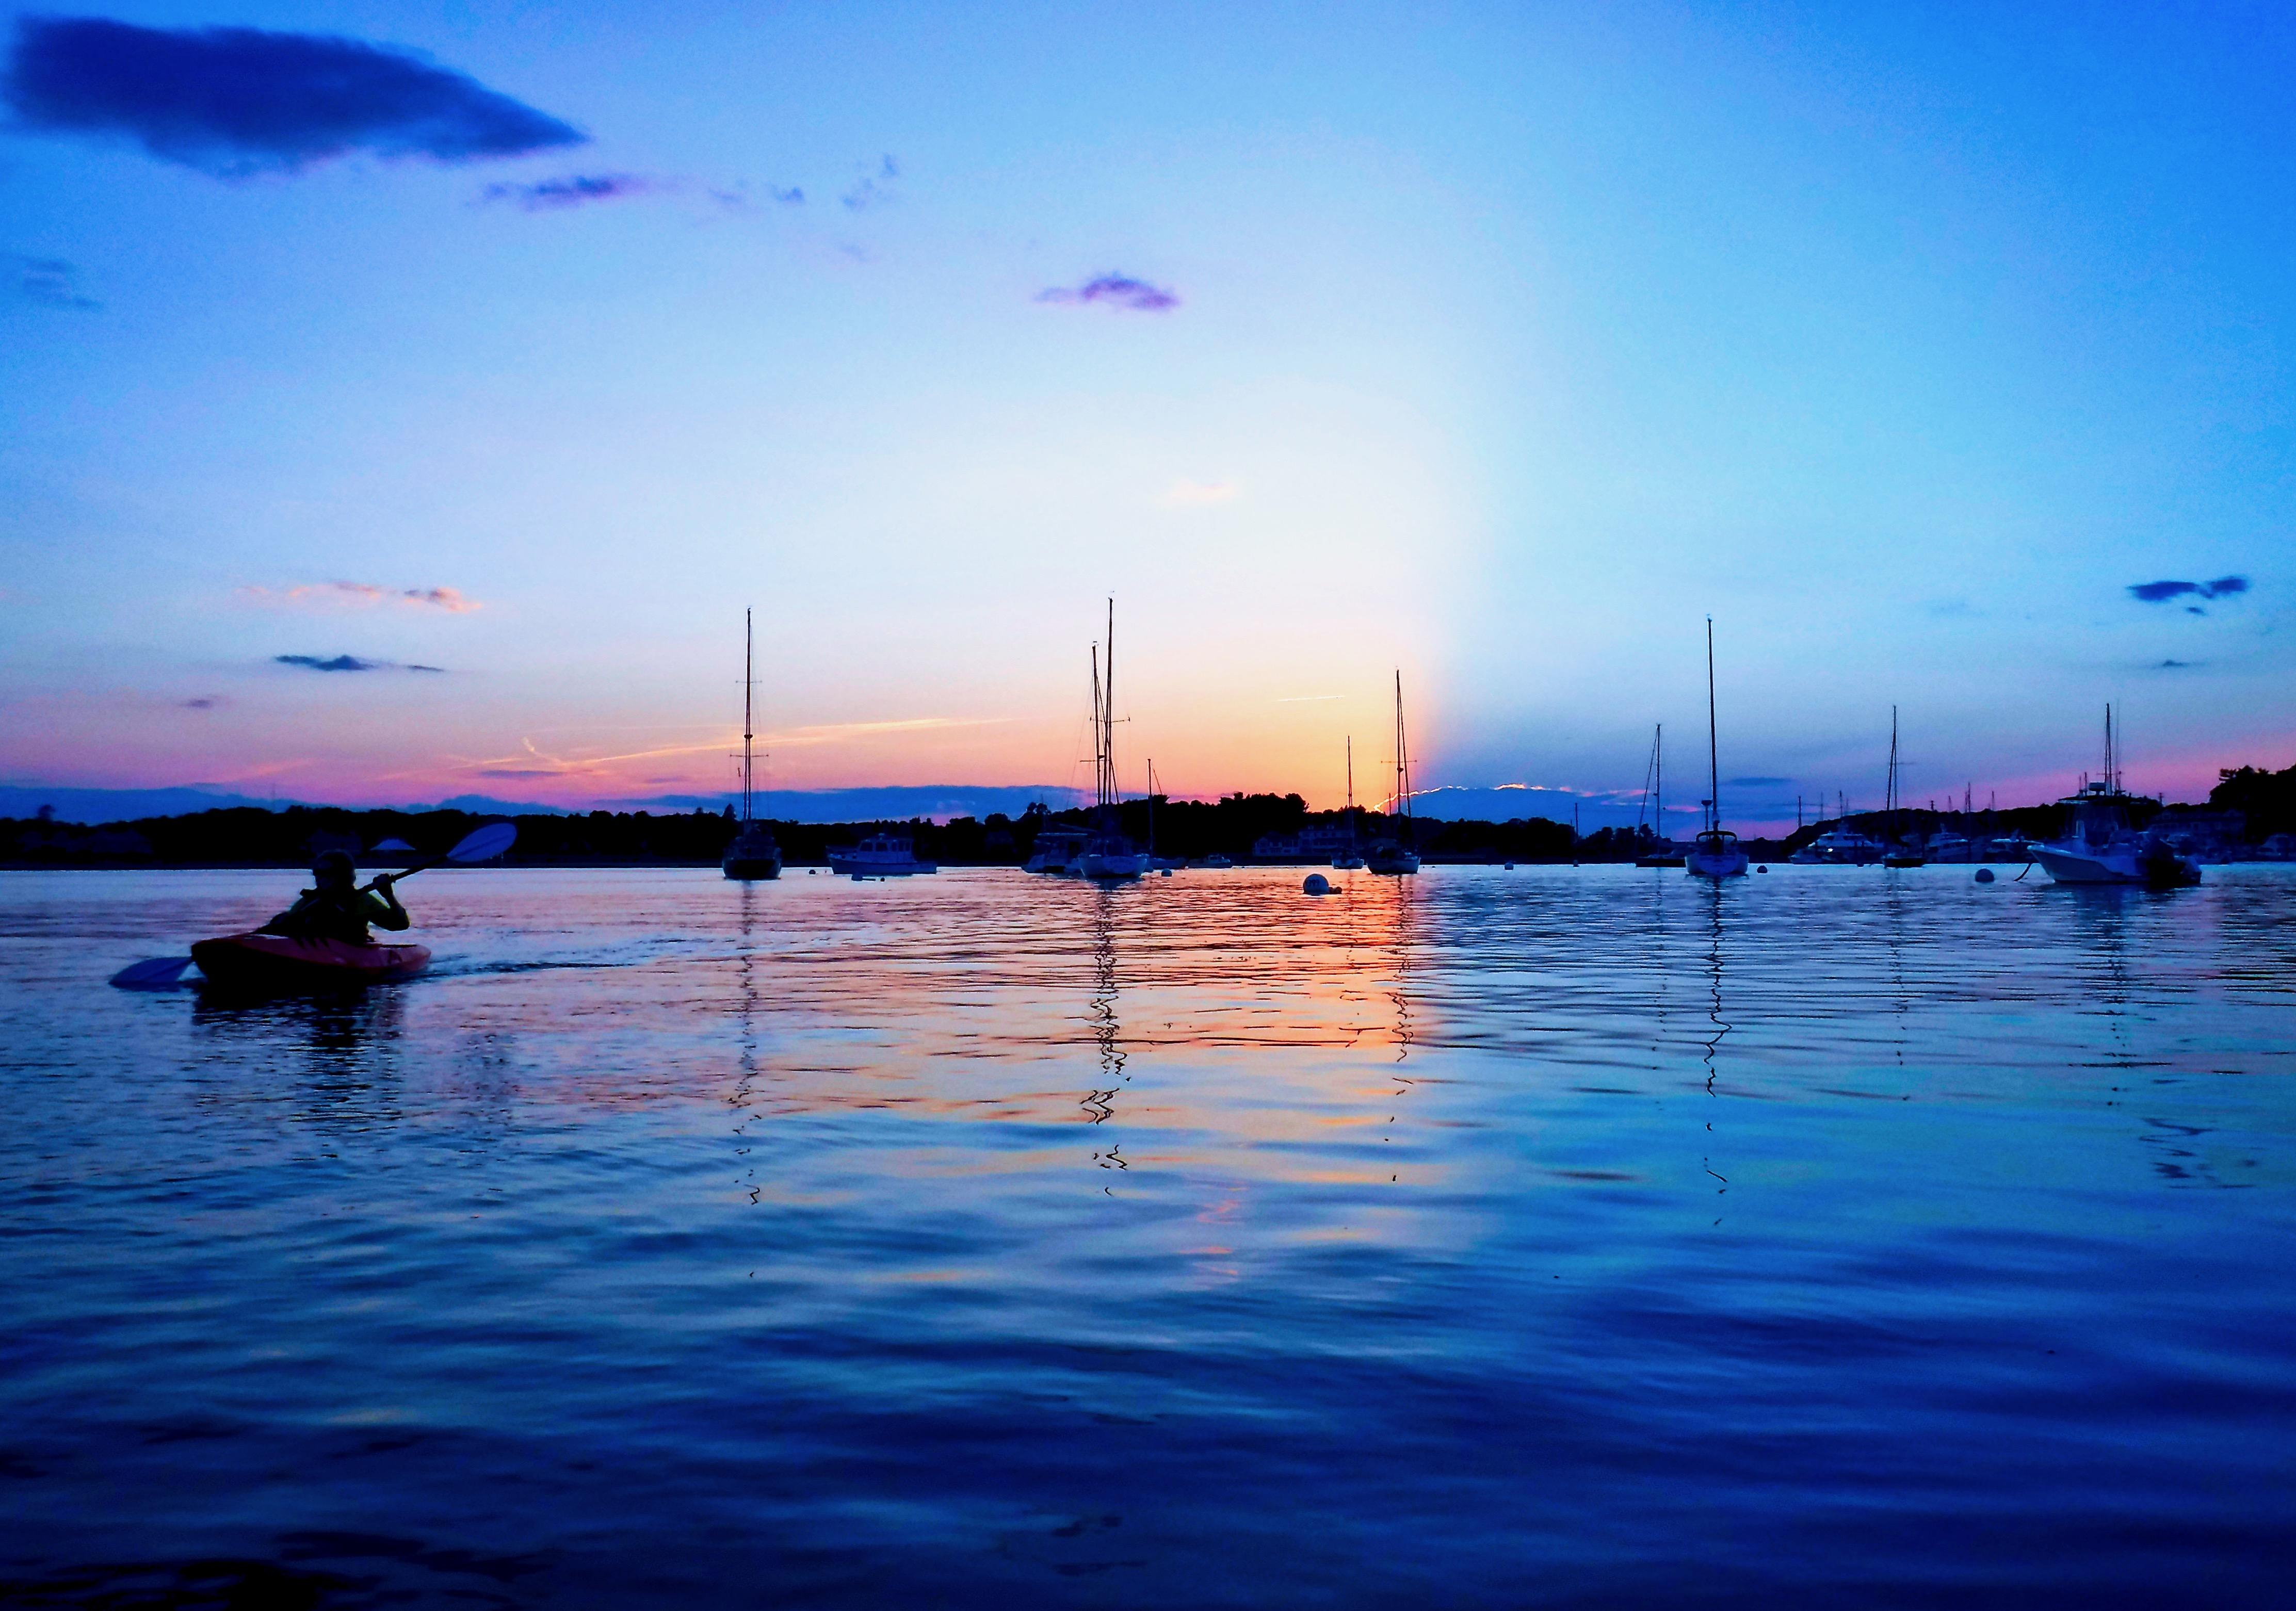 Kayaking-Little-Harbor-Odiorne Point